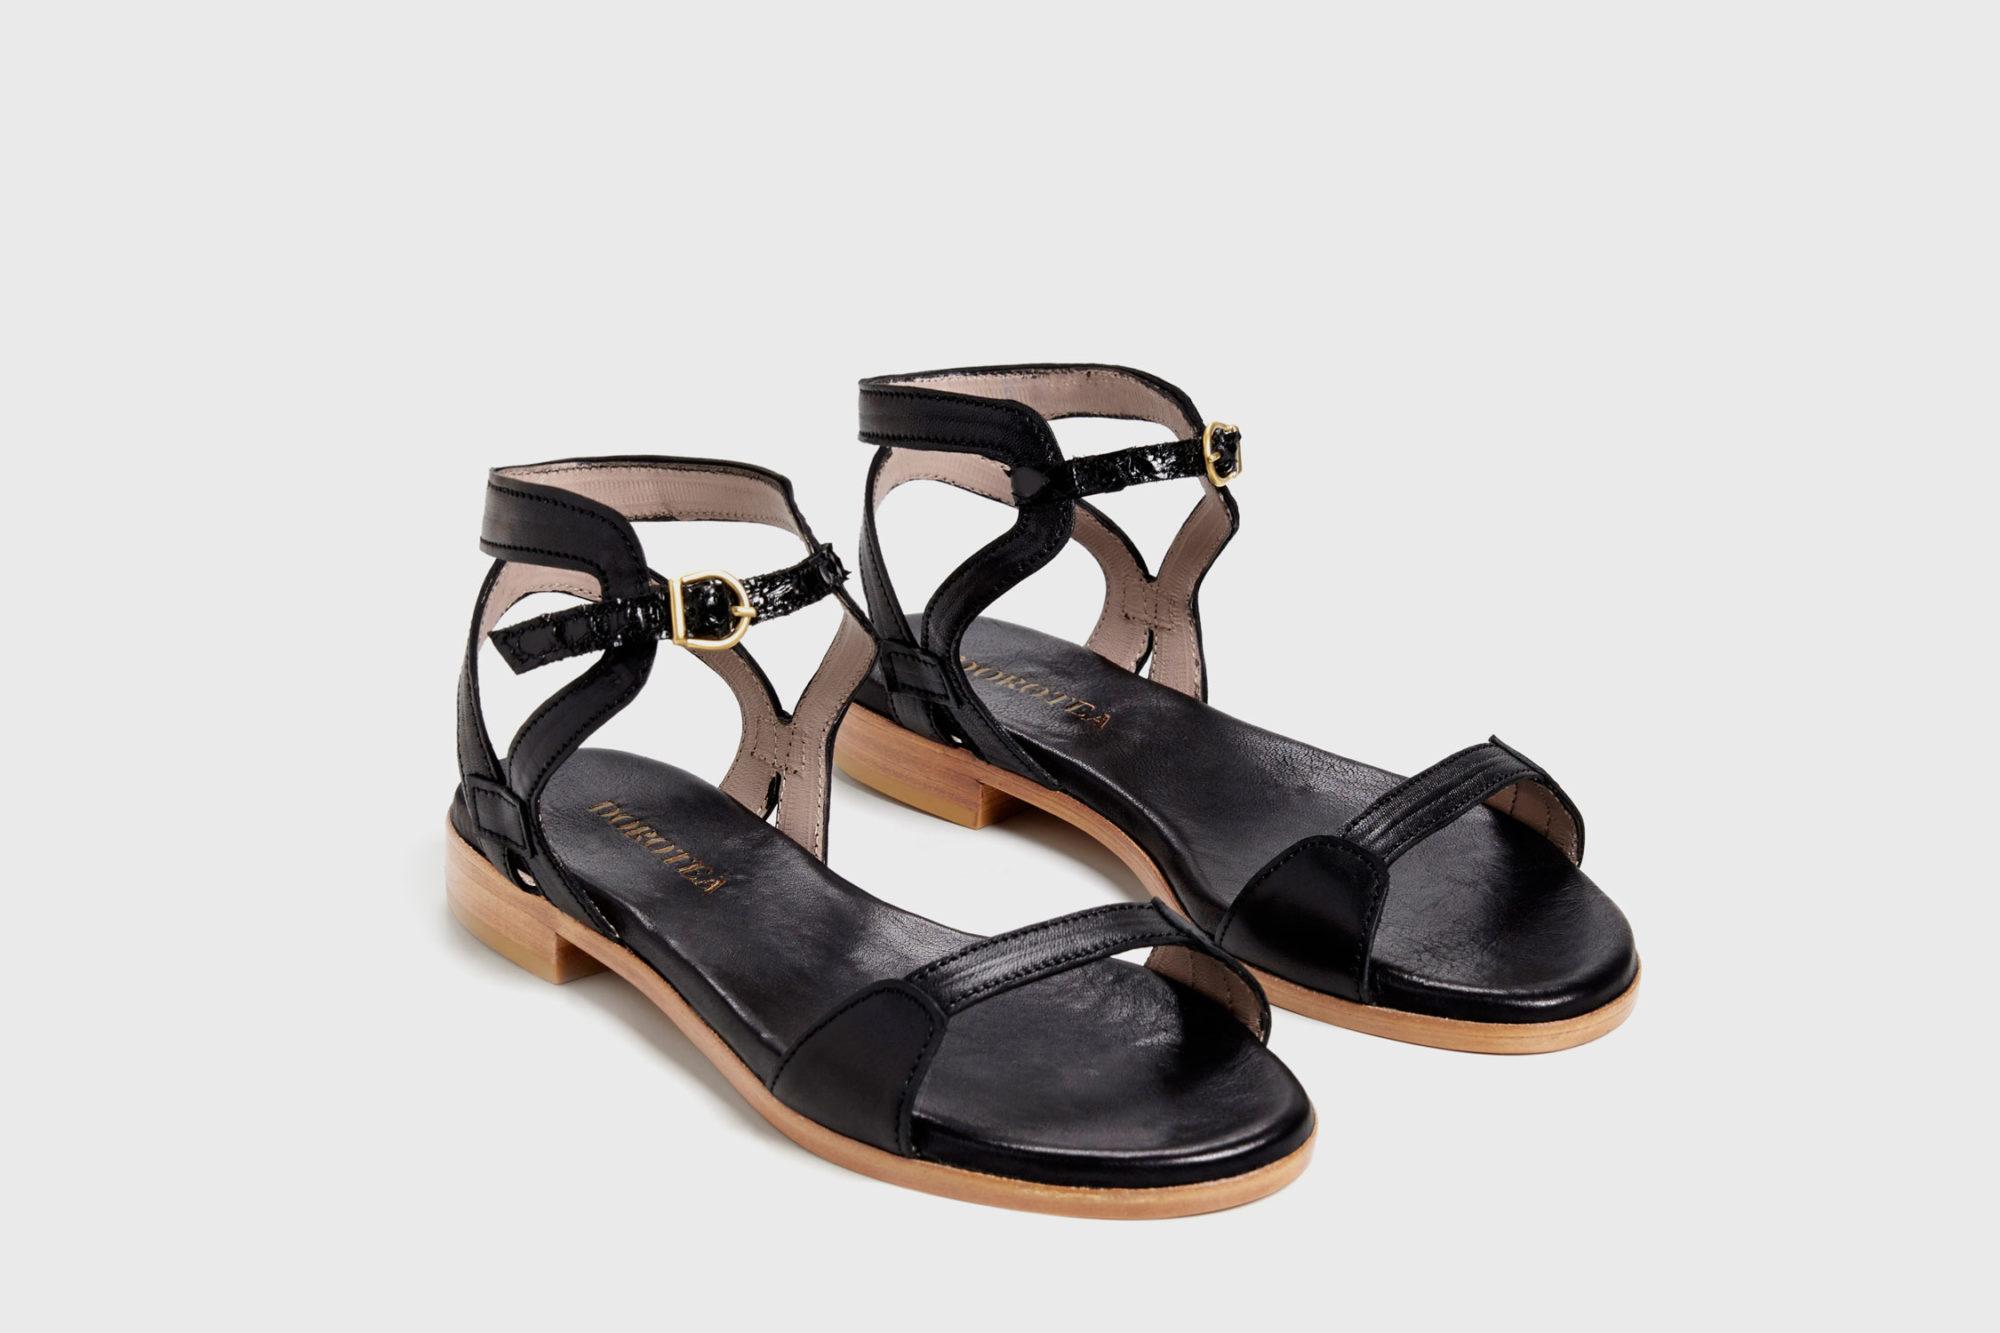 Dorotea sandalia plana Maya negra ss17 par